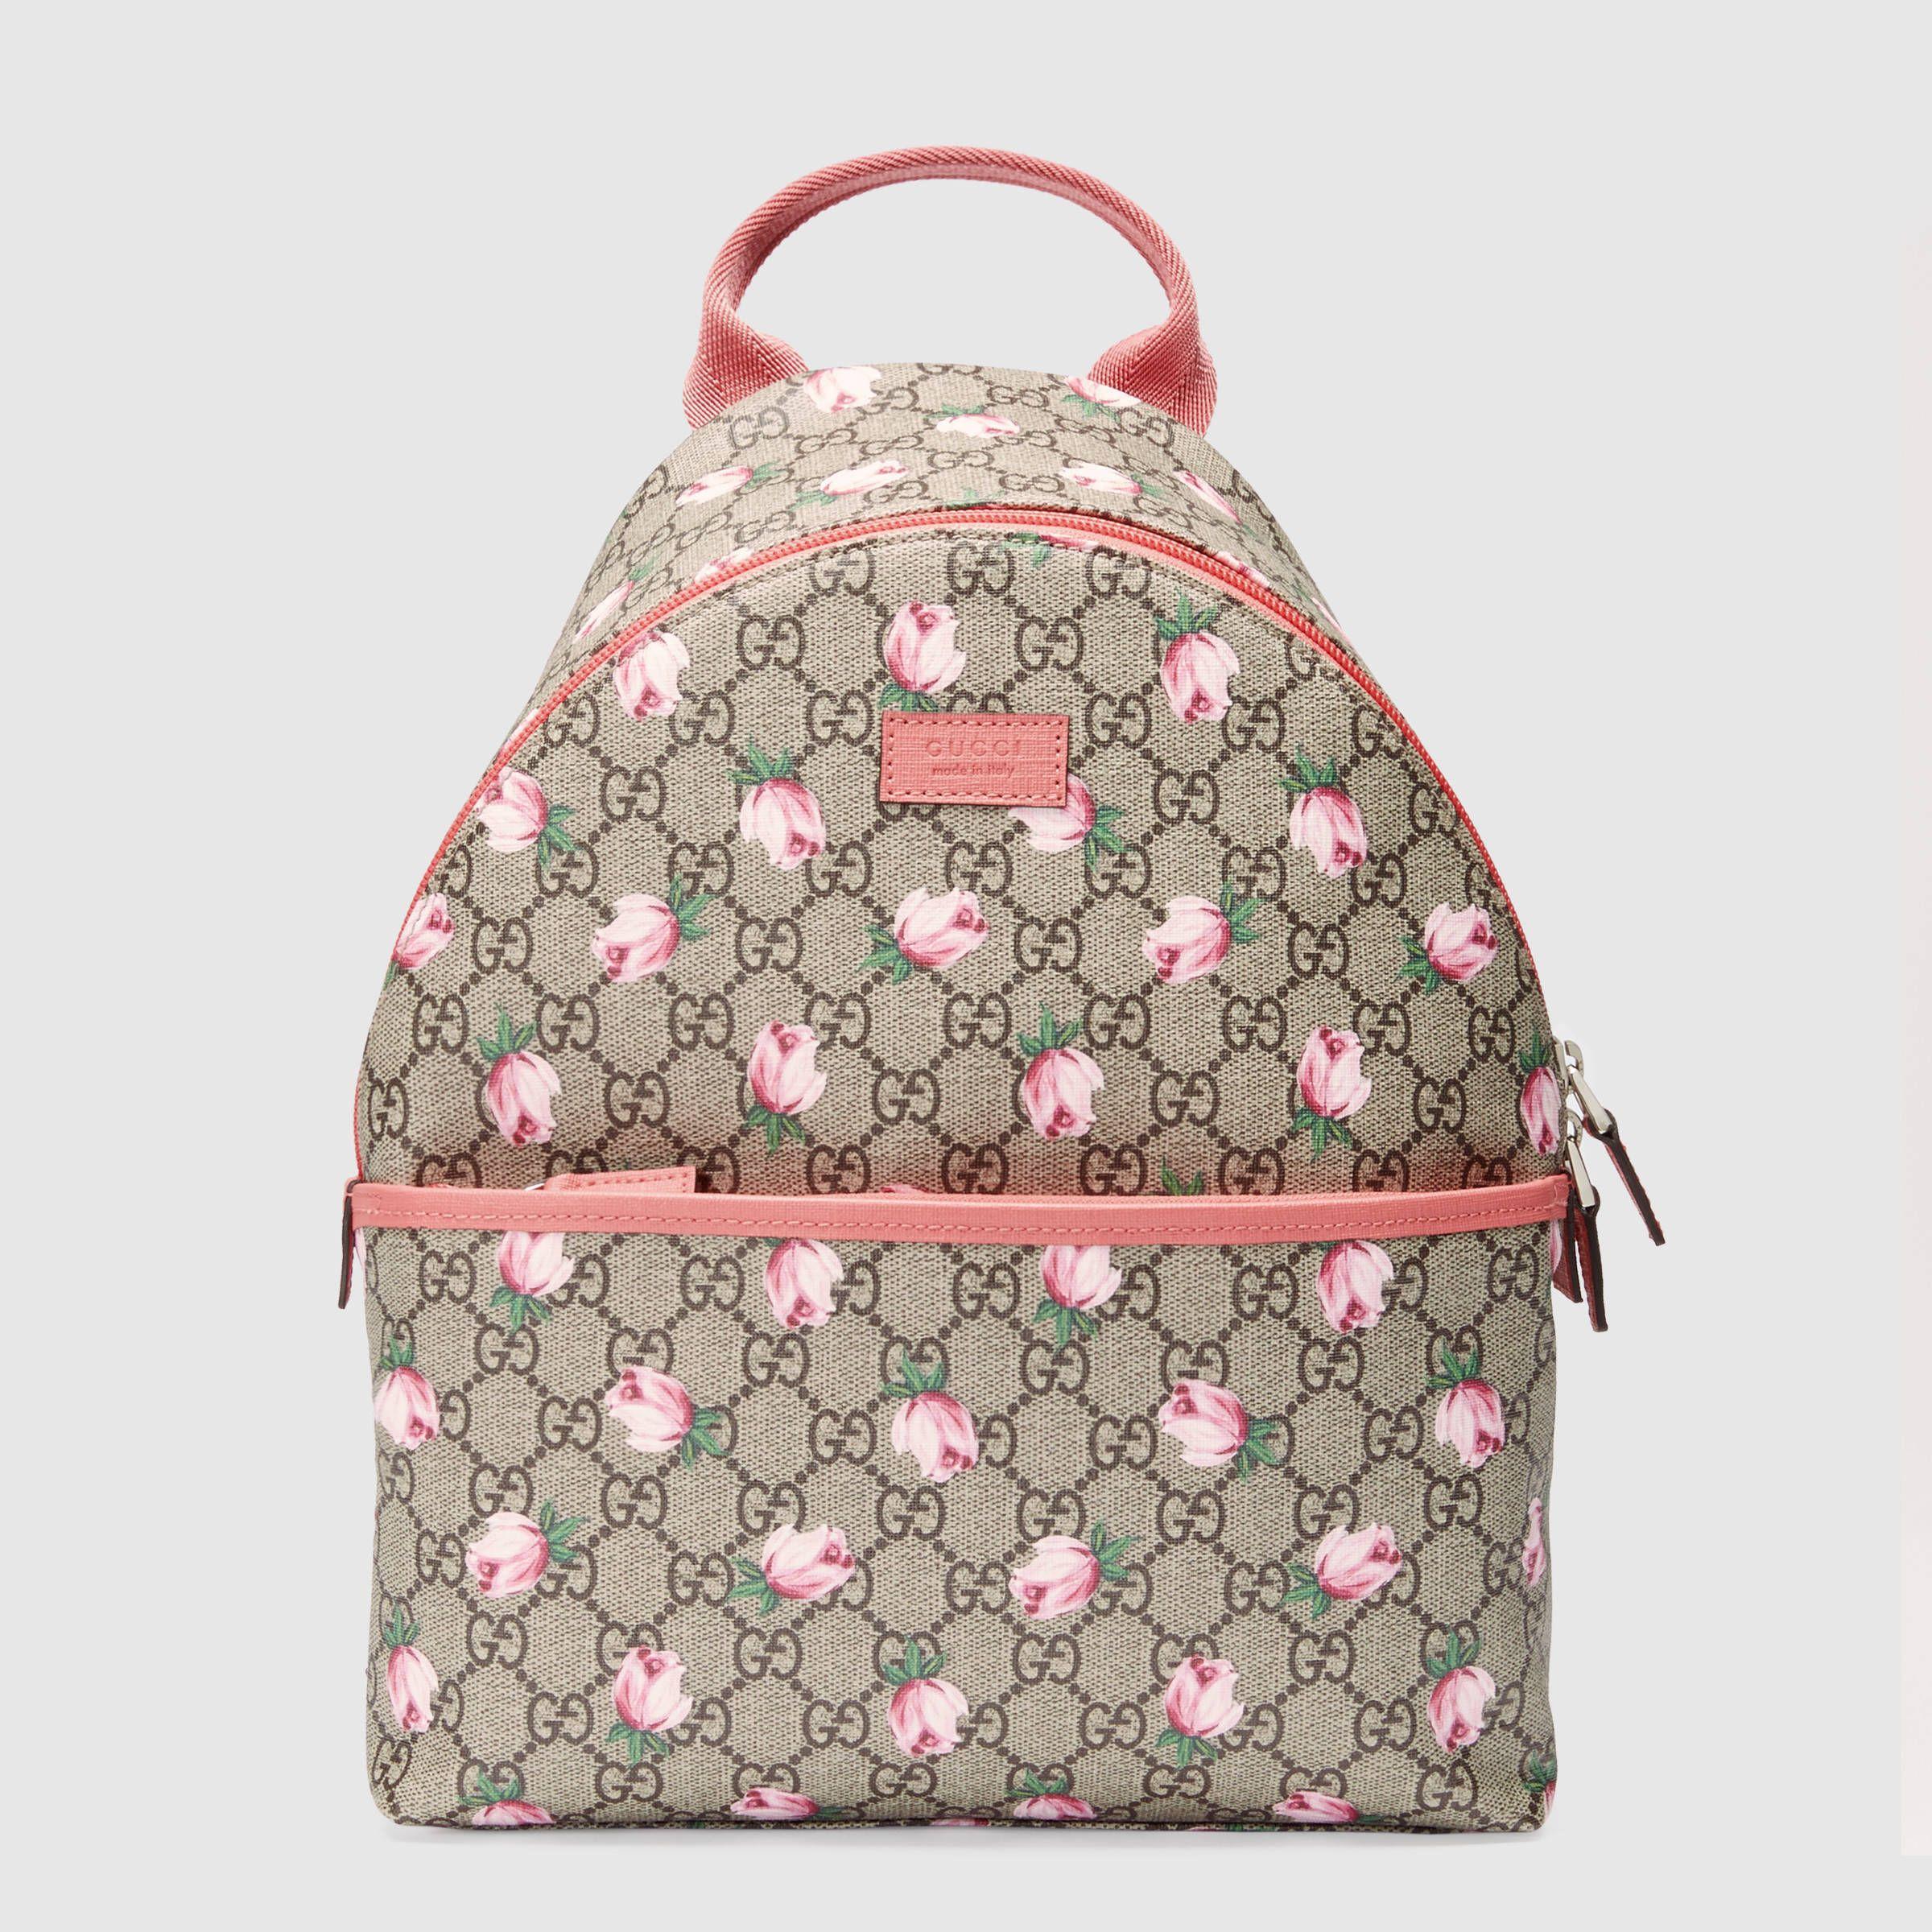 Gucci Children S Gg Flowers Backpack Sac Fille Sac à Dos Enfant Chaussures Bébé